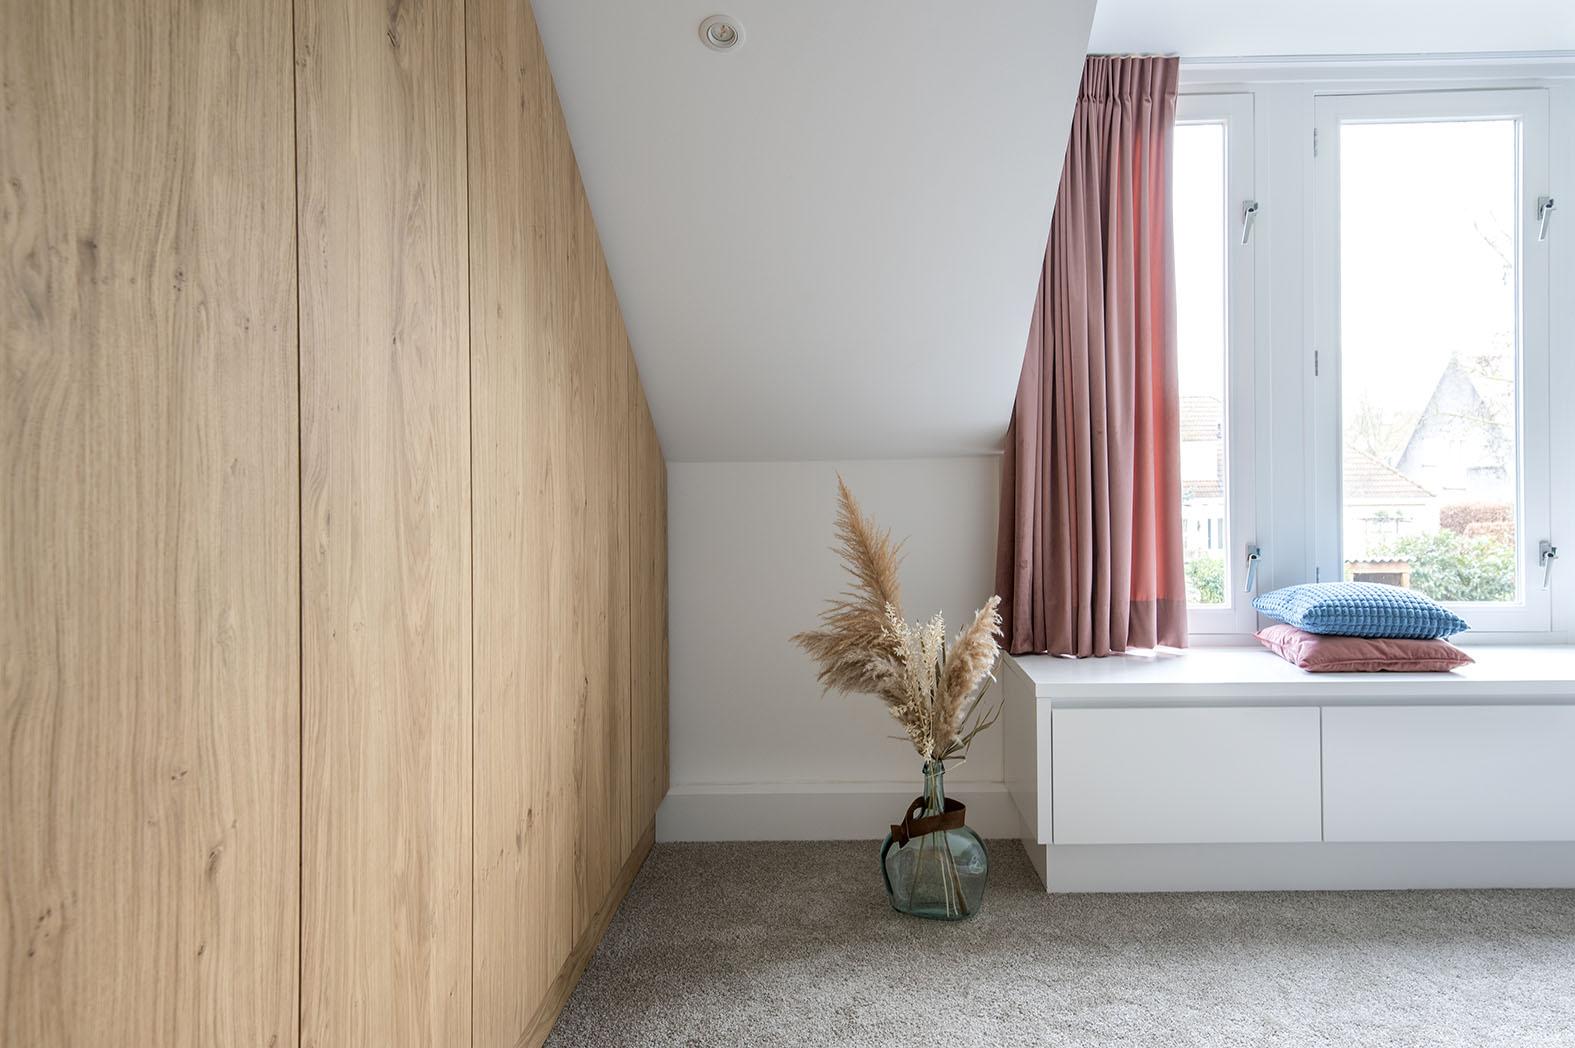 slaapkamer maatkasten laten maken interieuradvies Den Bosch stijlen